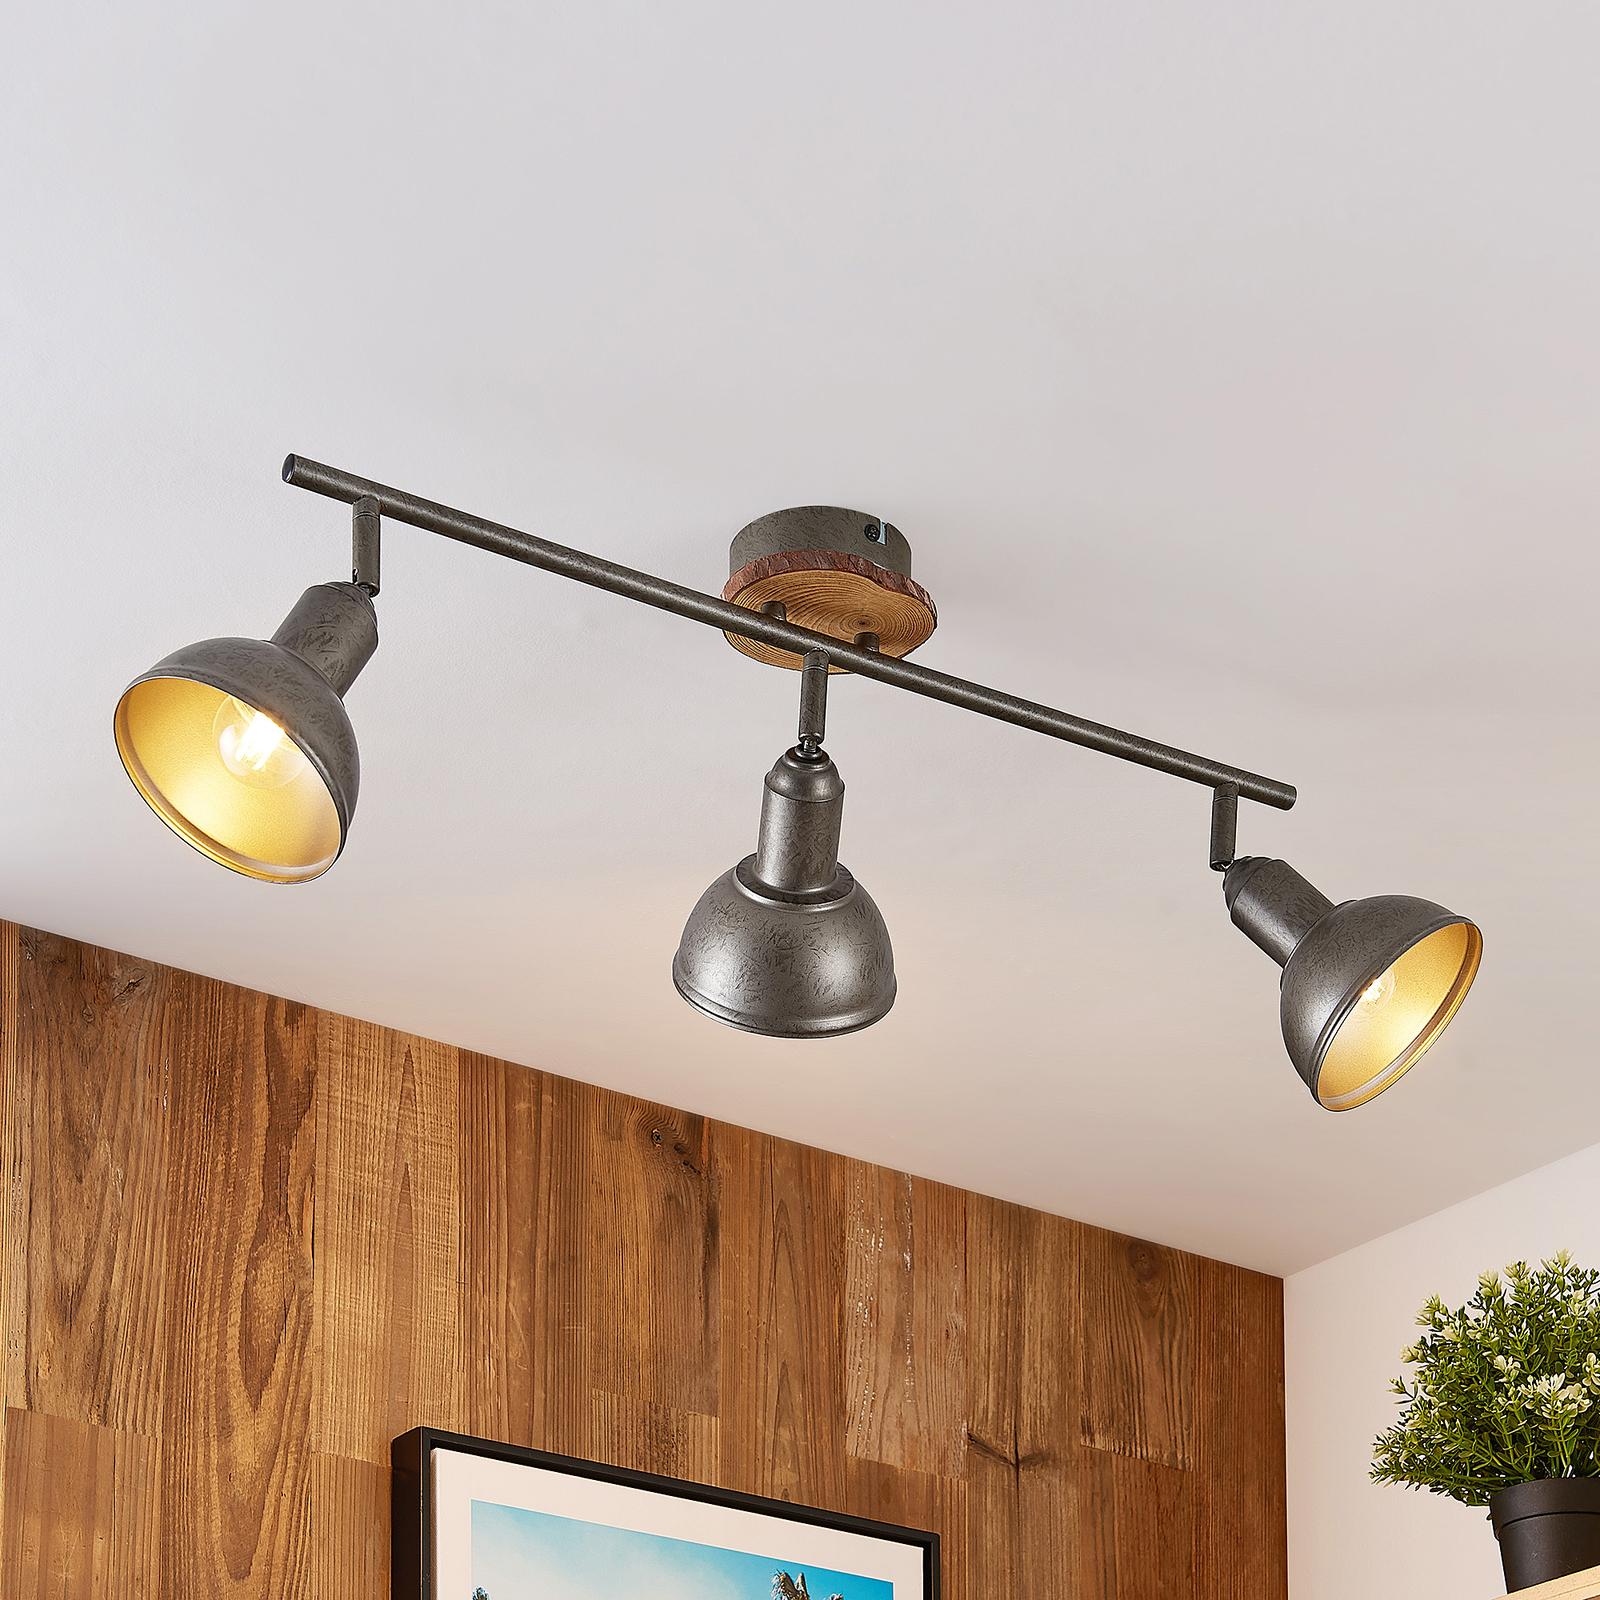 Lindby Nesrin plafonnier disque bois, 3 lampes